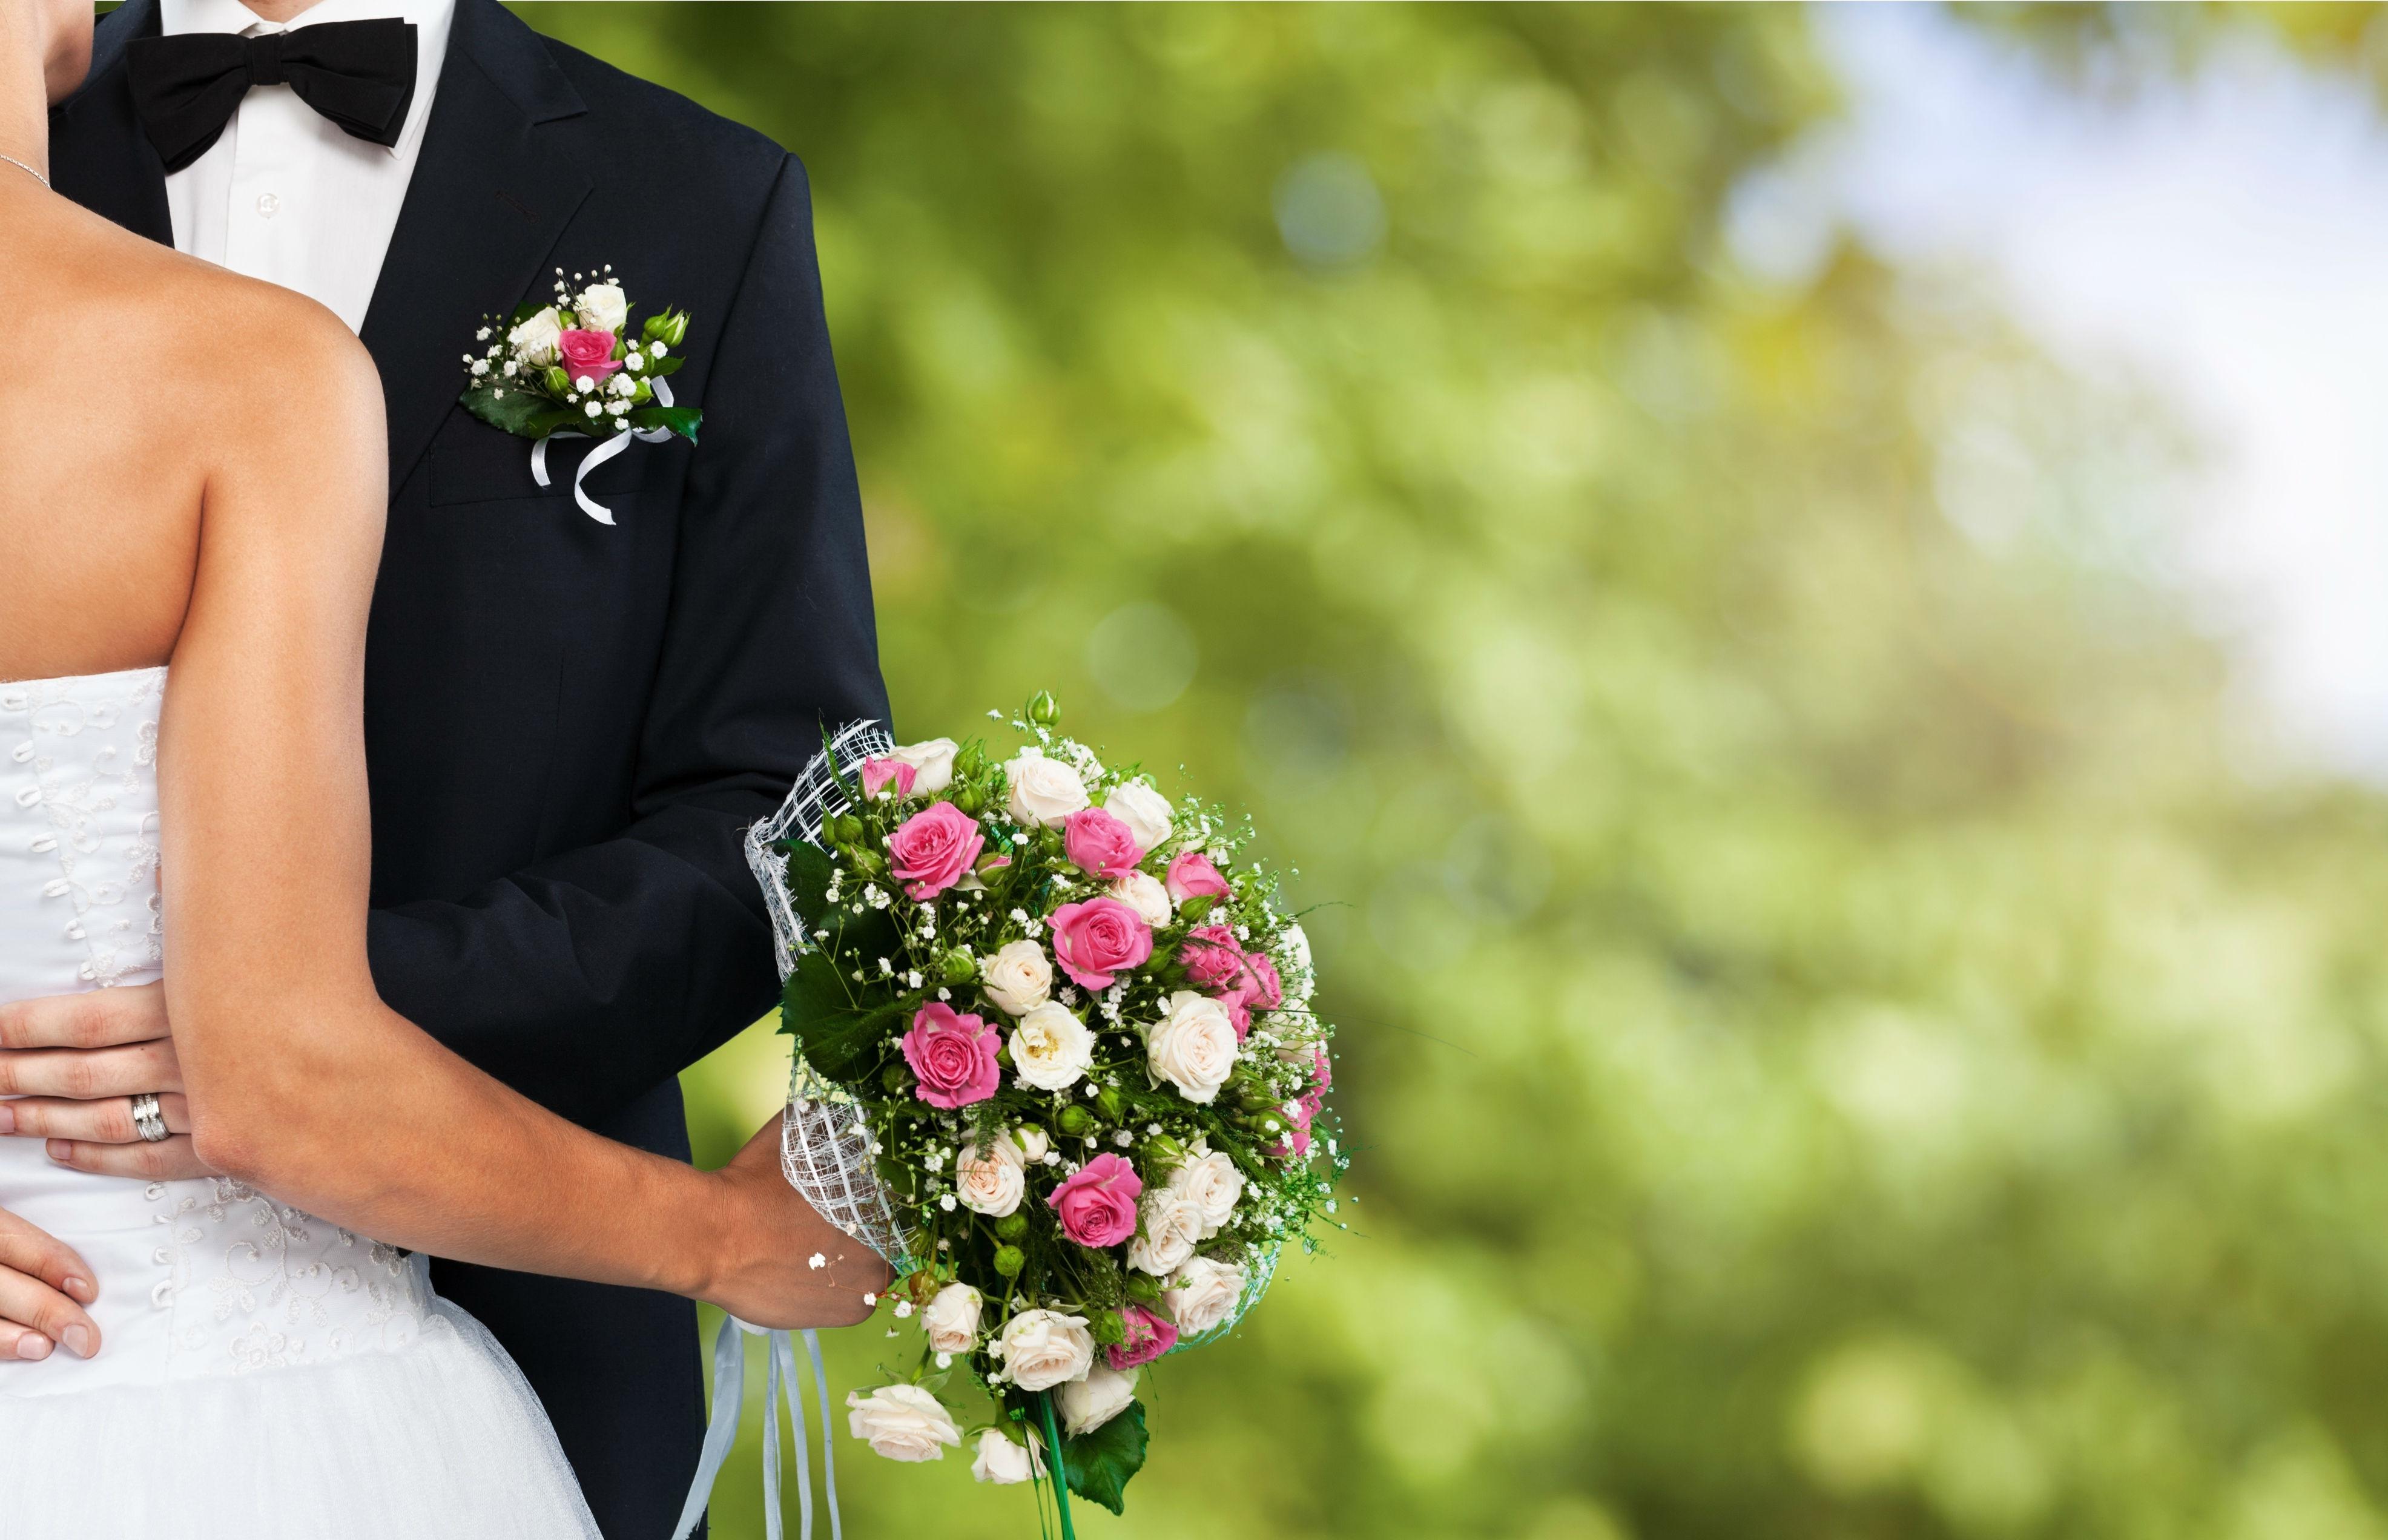 Wedding Gift Tax: How To Cut Your Inheritance Tax Bill